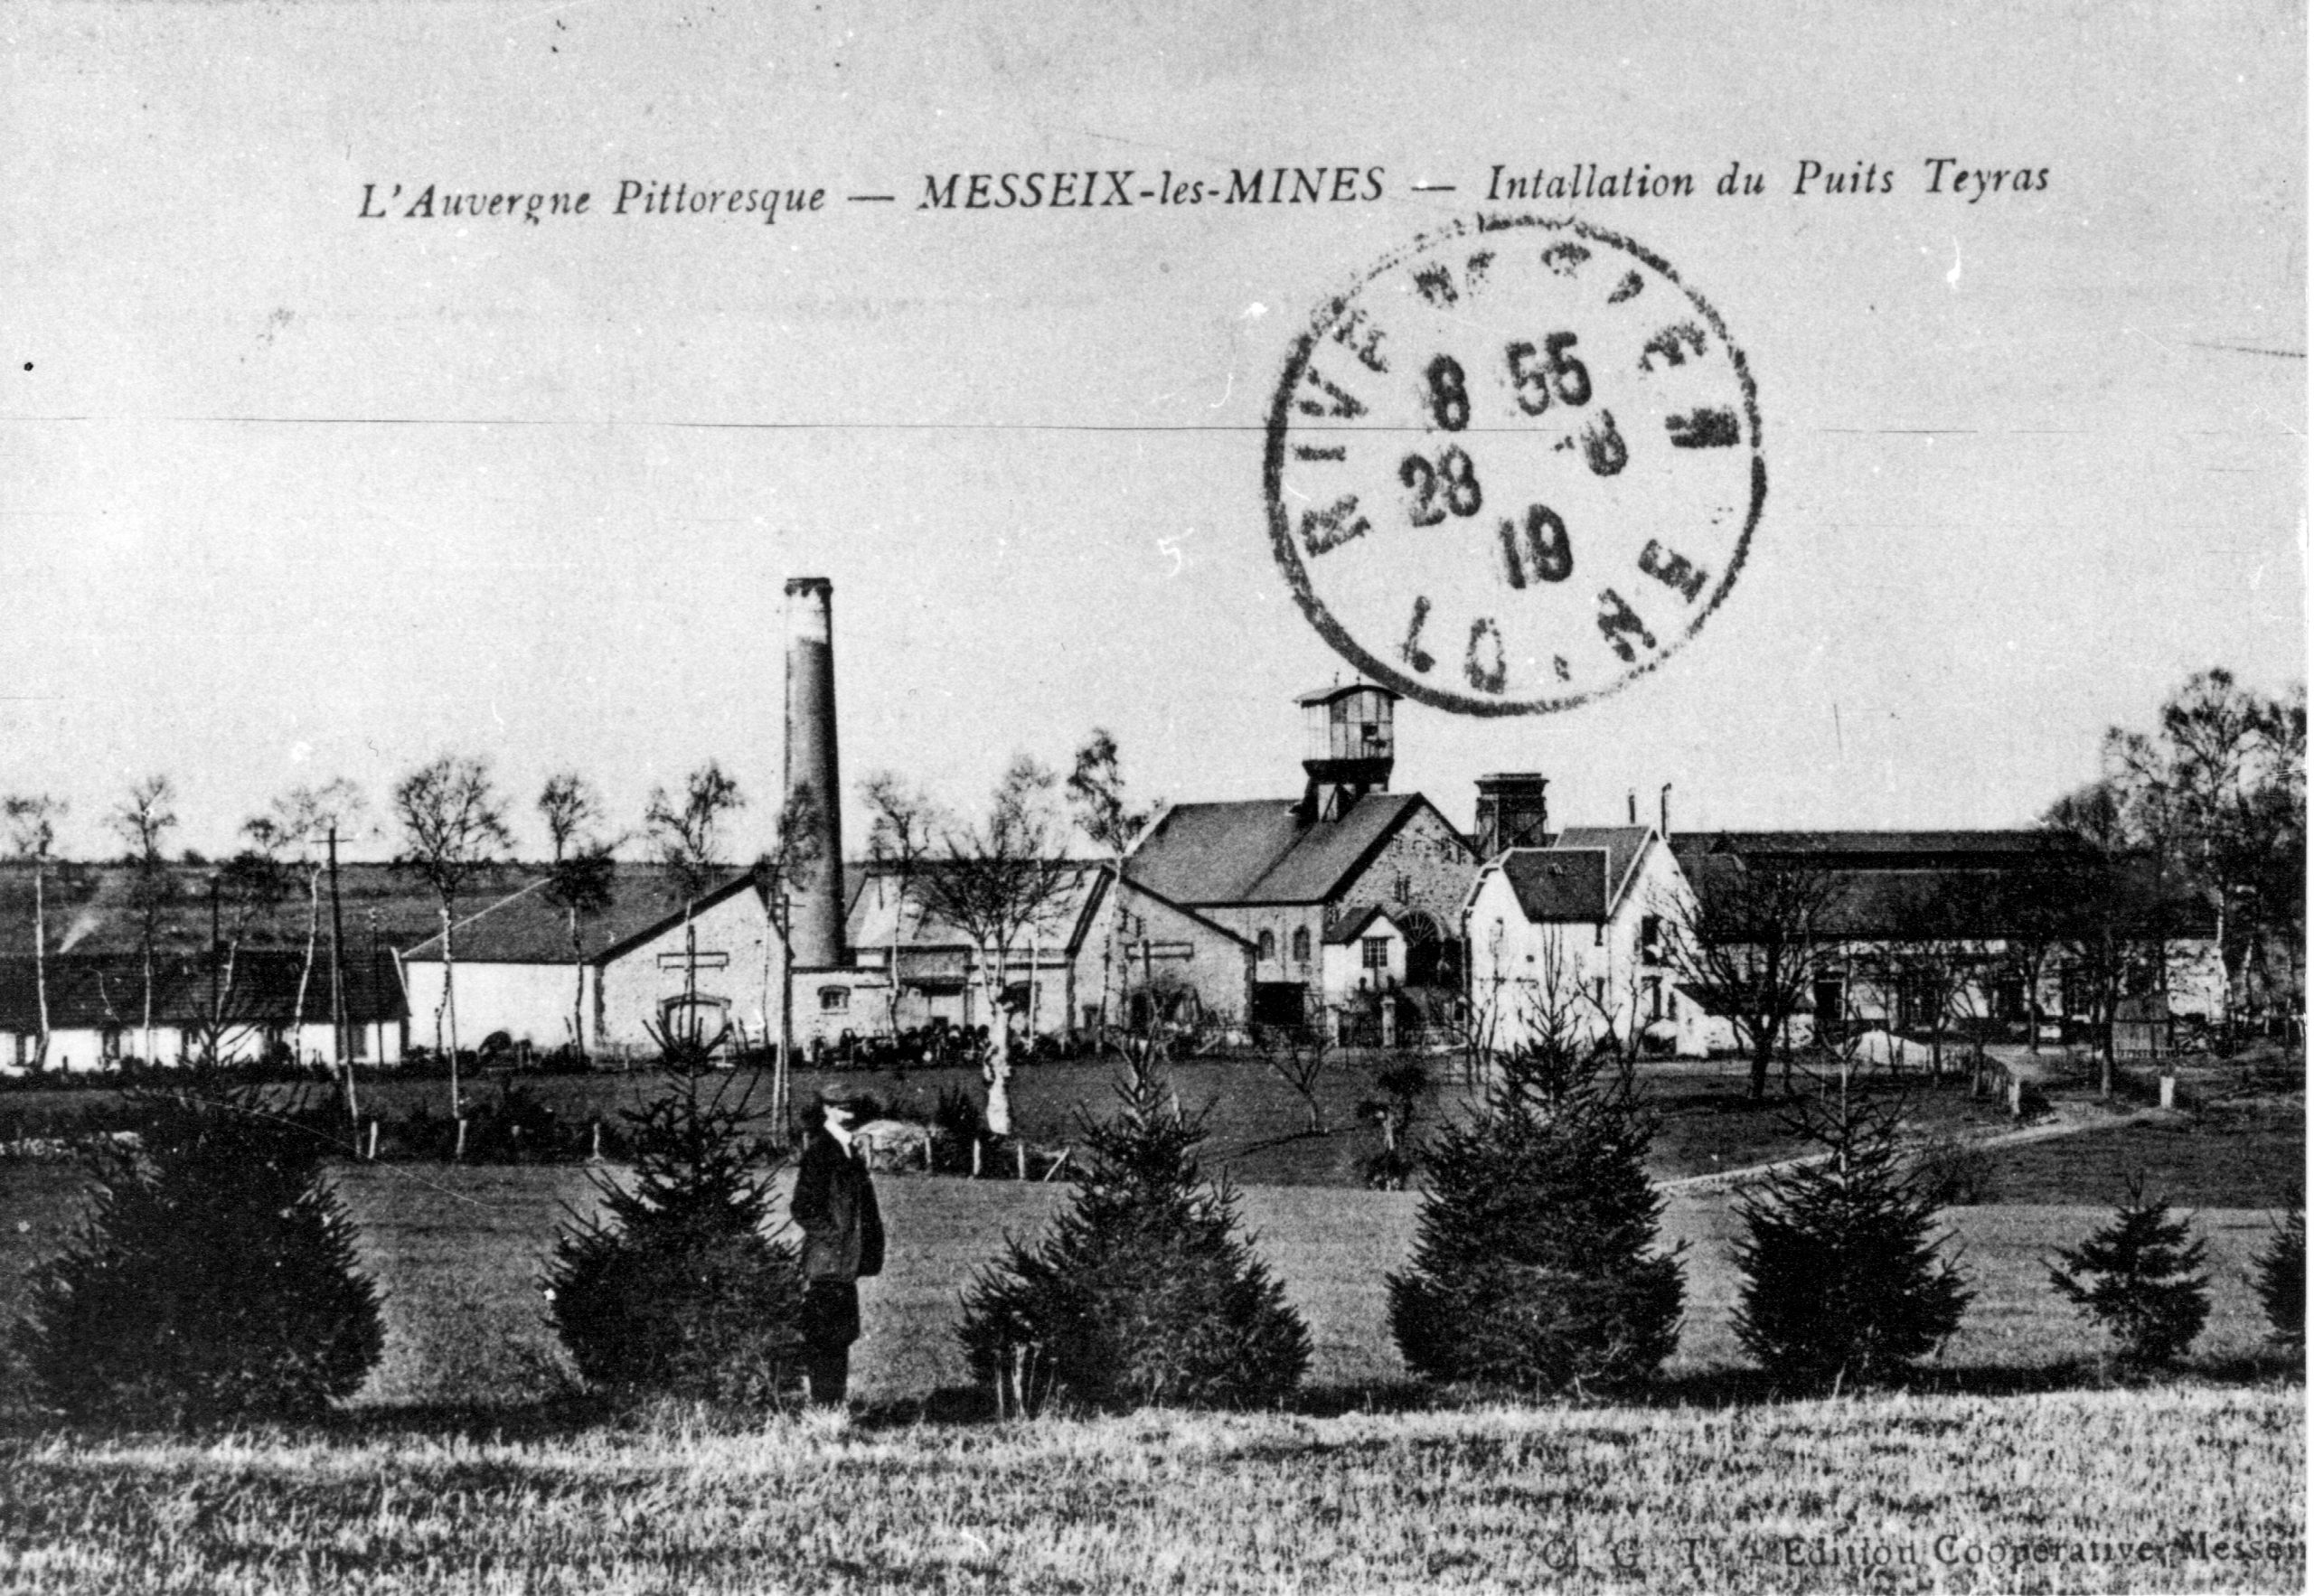 histoire de la mine de Messeix - Le Puits TEYRAS.